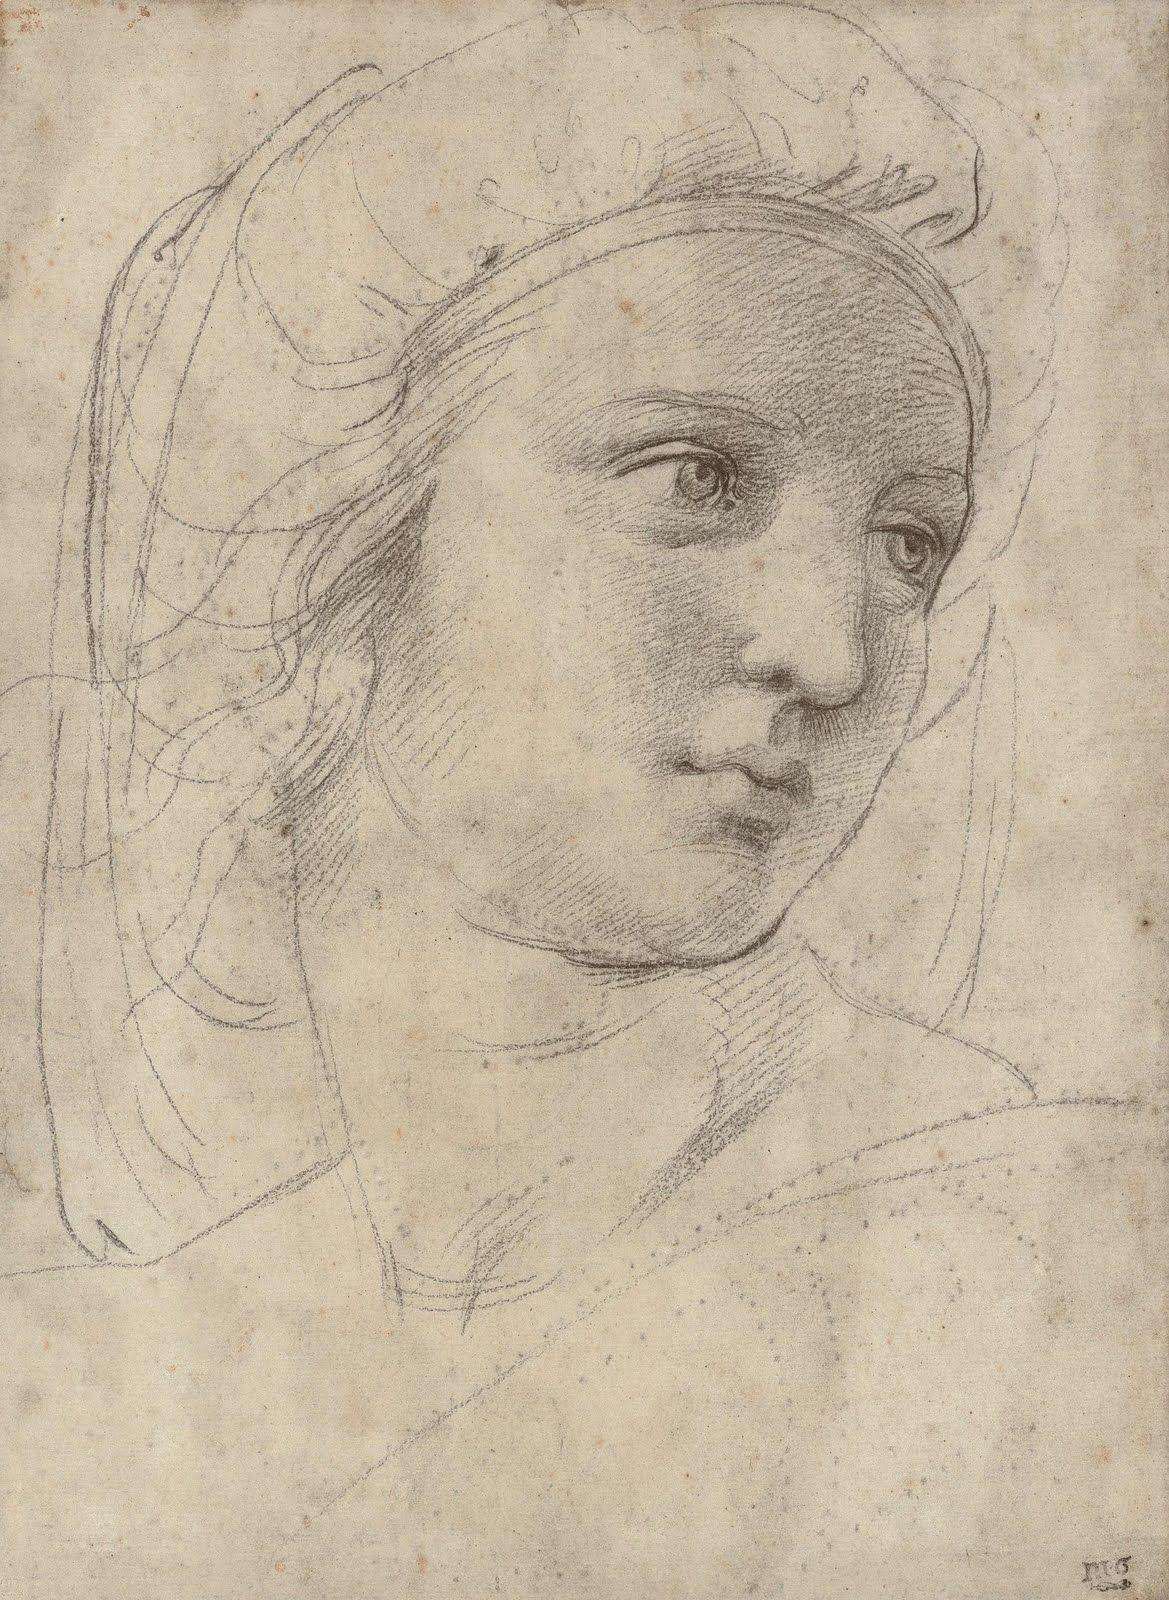 Raphael SelfPortrait Black Chlk Oxford The Ashmolean Museum - Picassos vintage light drawings pleasure behold